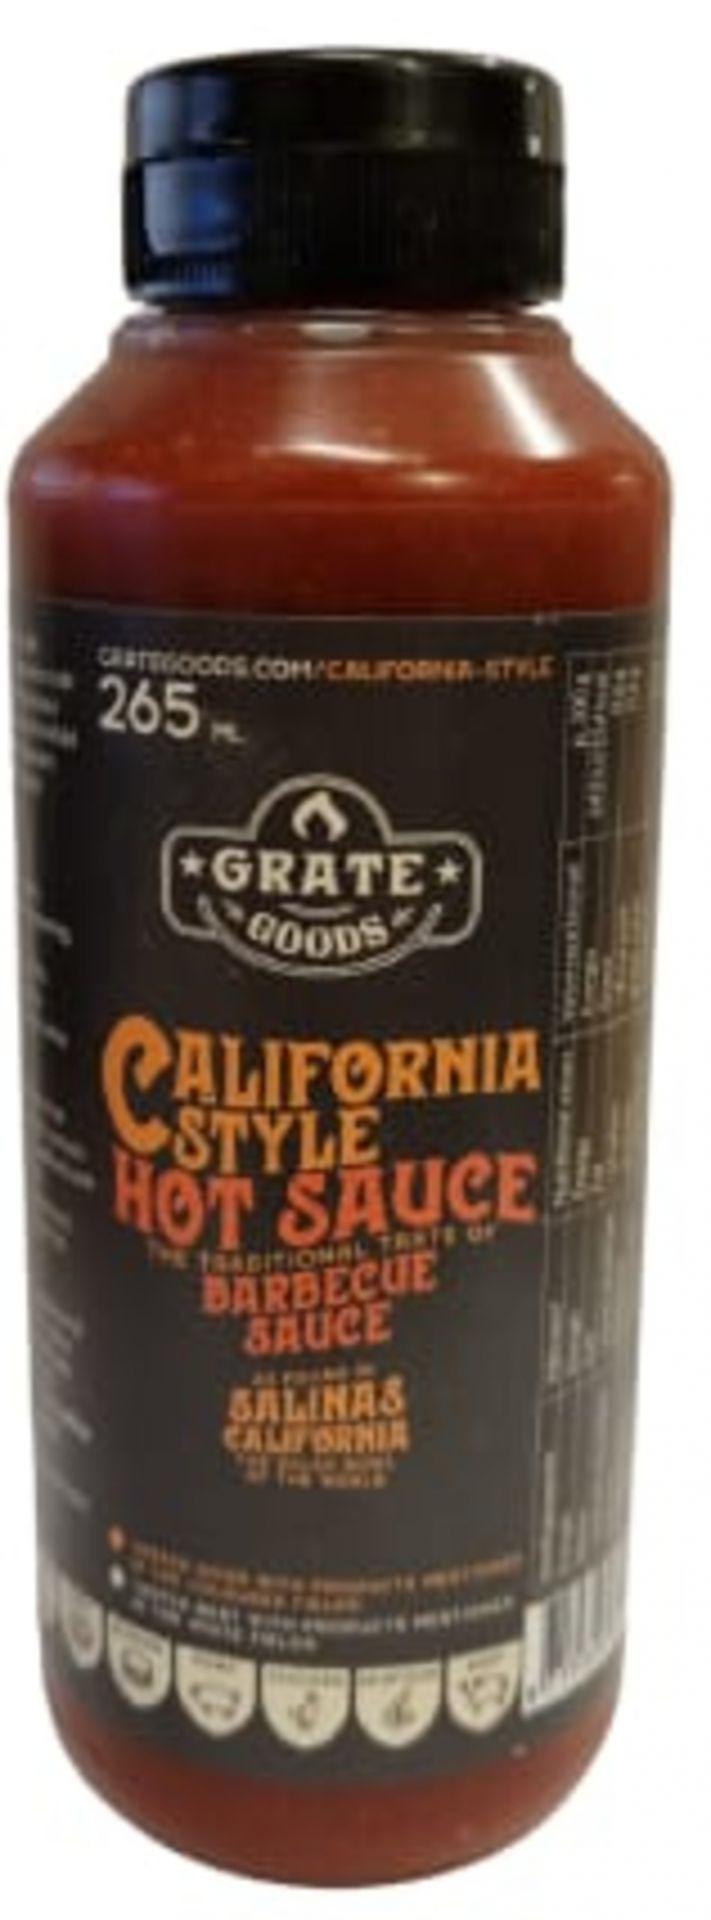 Grate Goods California Hot BBQ Sauce 265ml